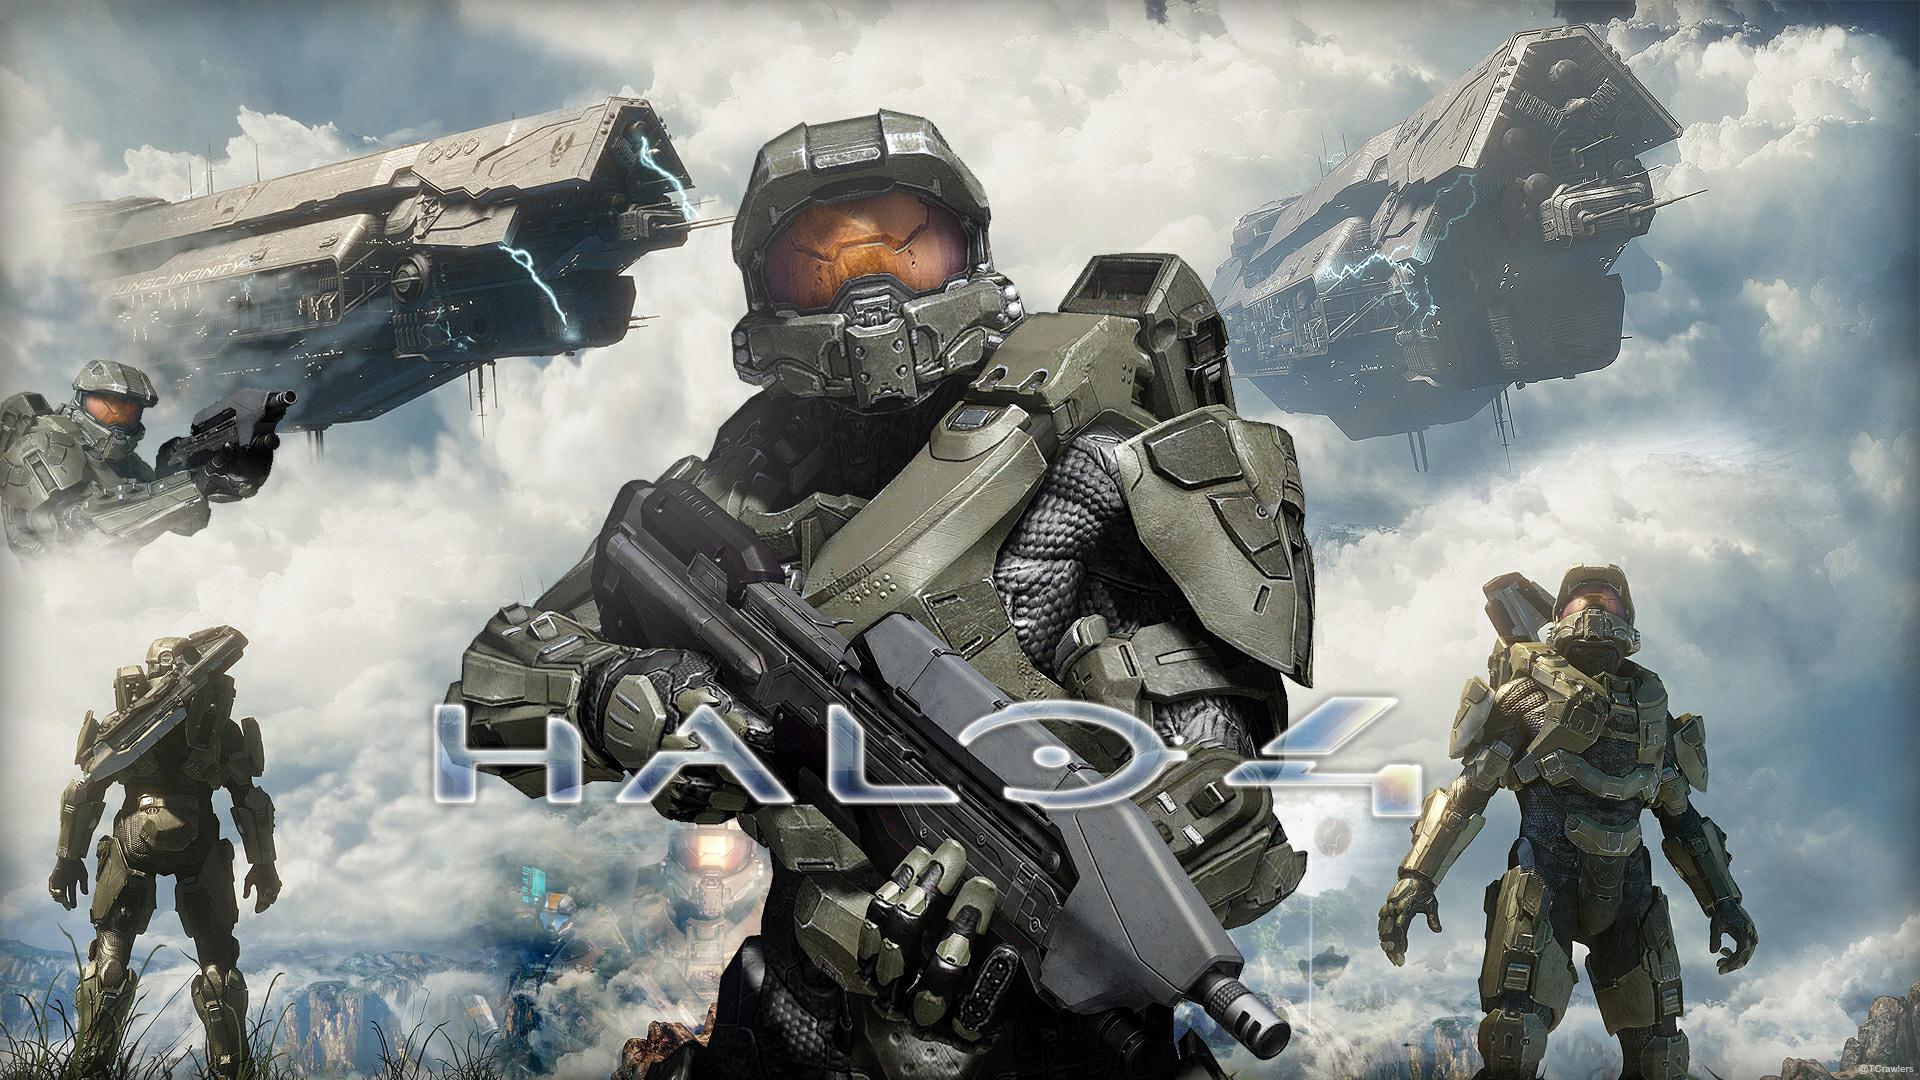 Halo 5 wallpapers xbox one wallpapersafari - Halo 5 screensaver ...